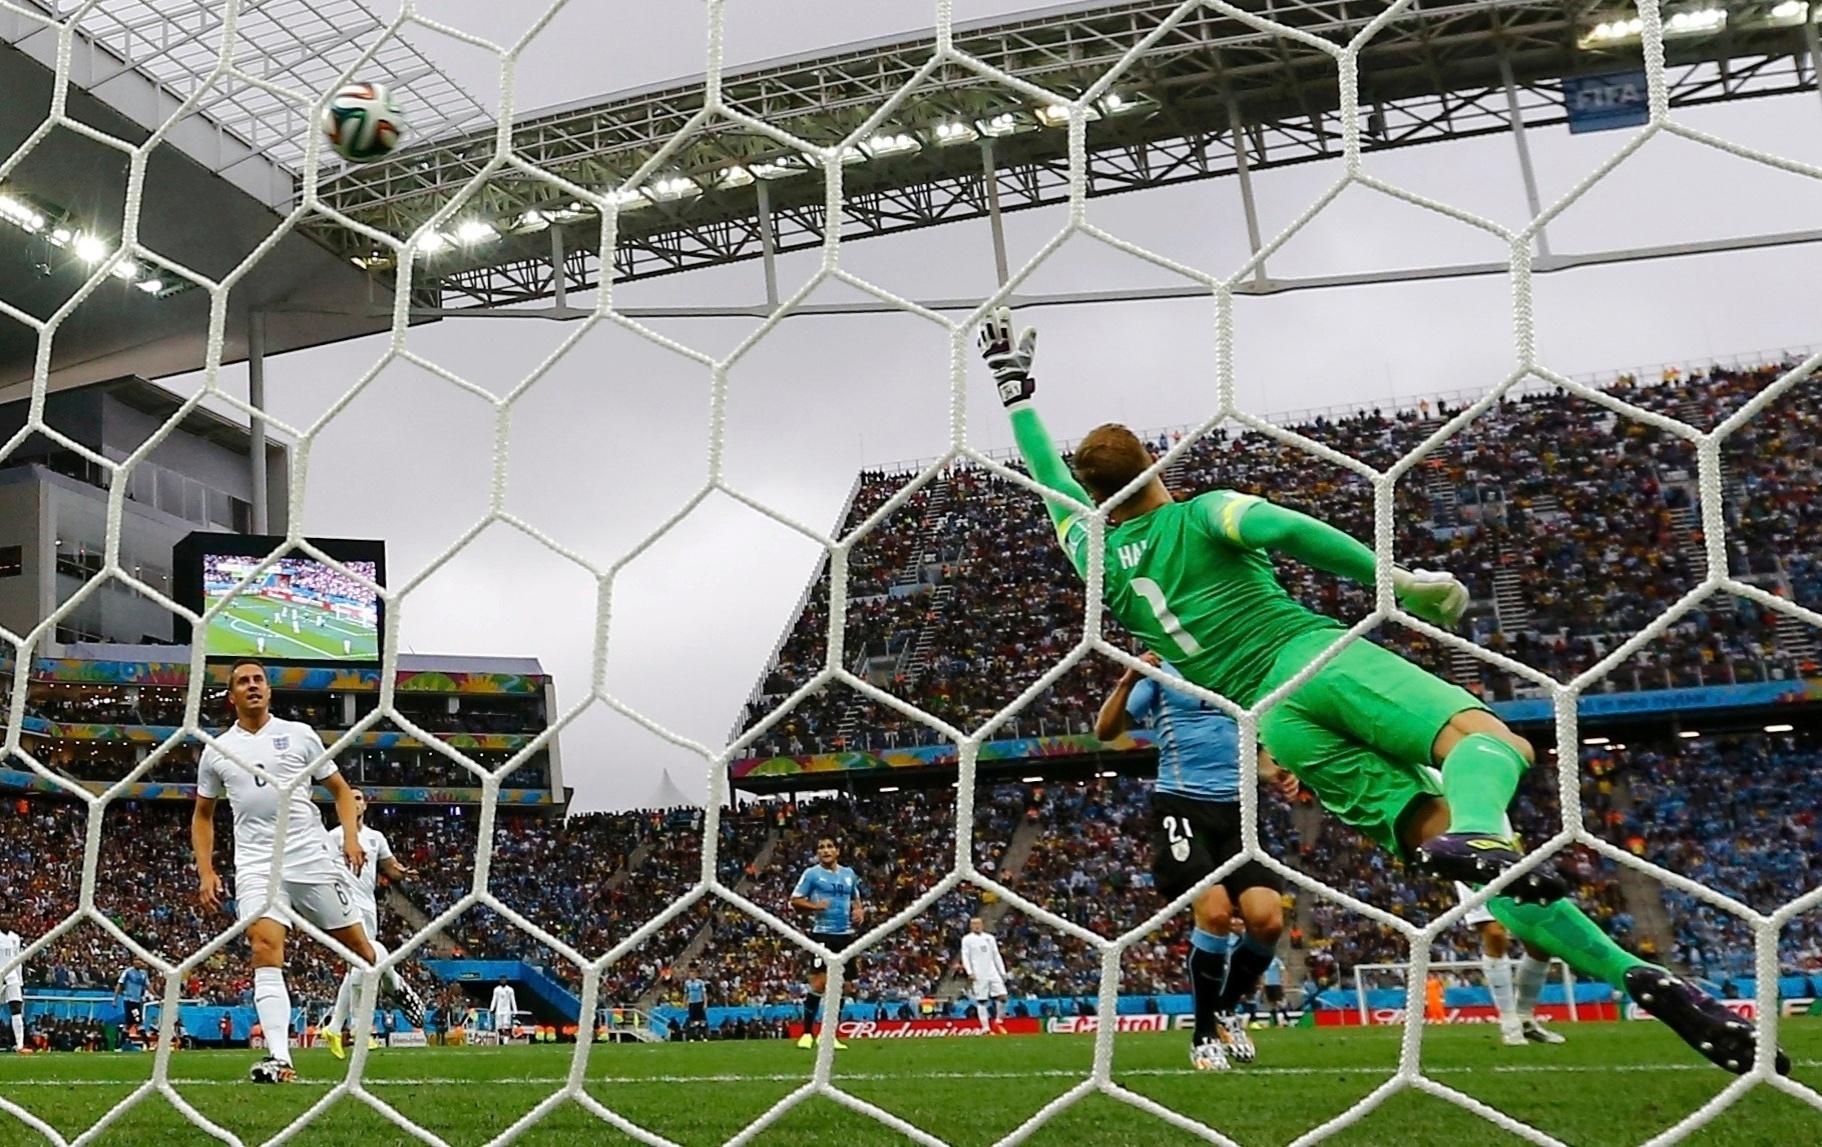 19.jun.2014 - Inglês Joe Hart pula para fazer boa defesa contra o Uruguai, pela segunda rodada da Copa do Mundo